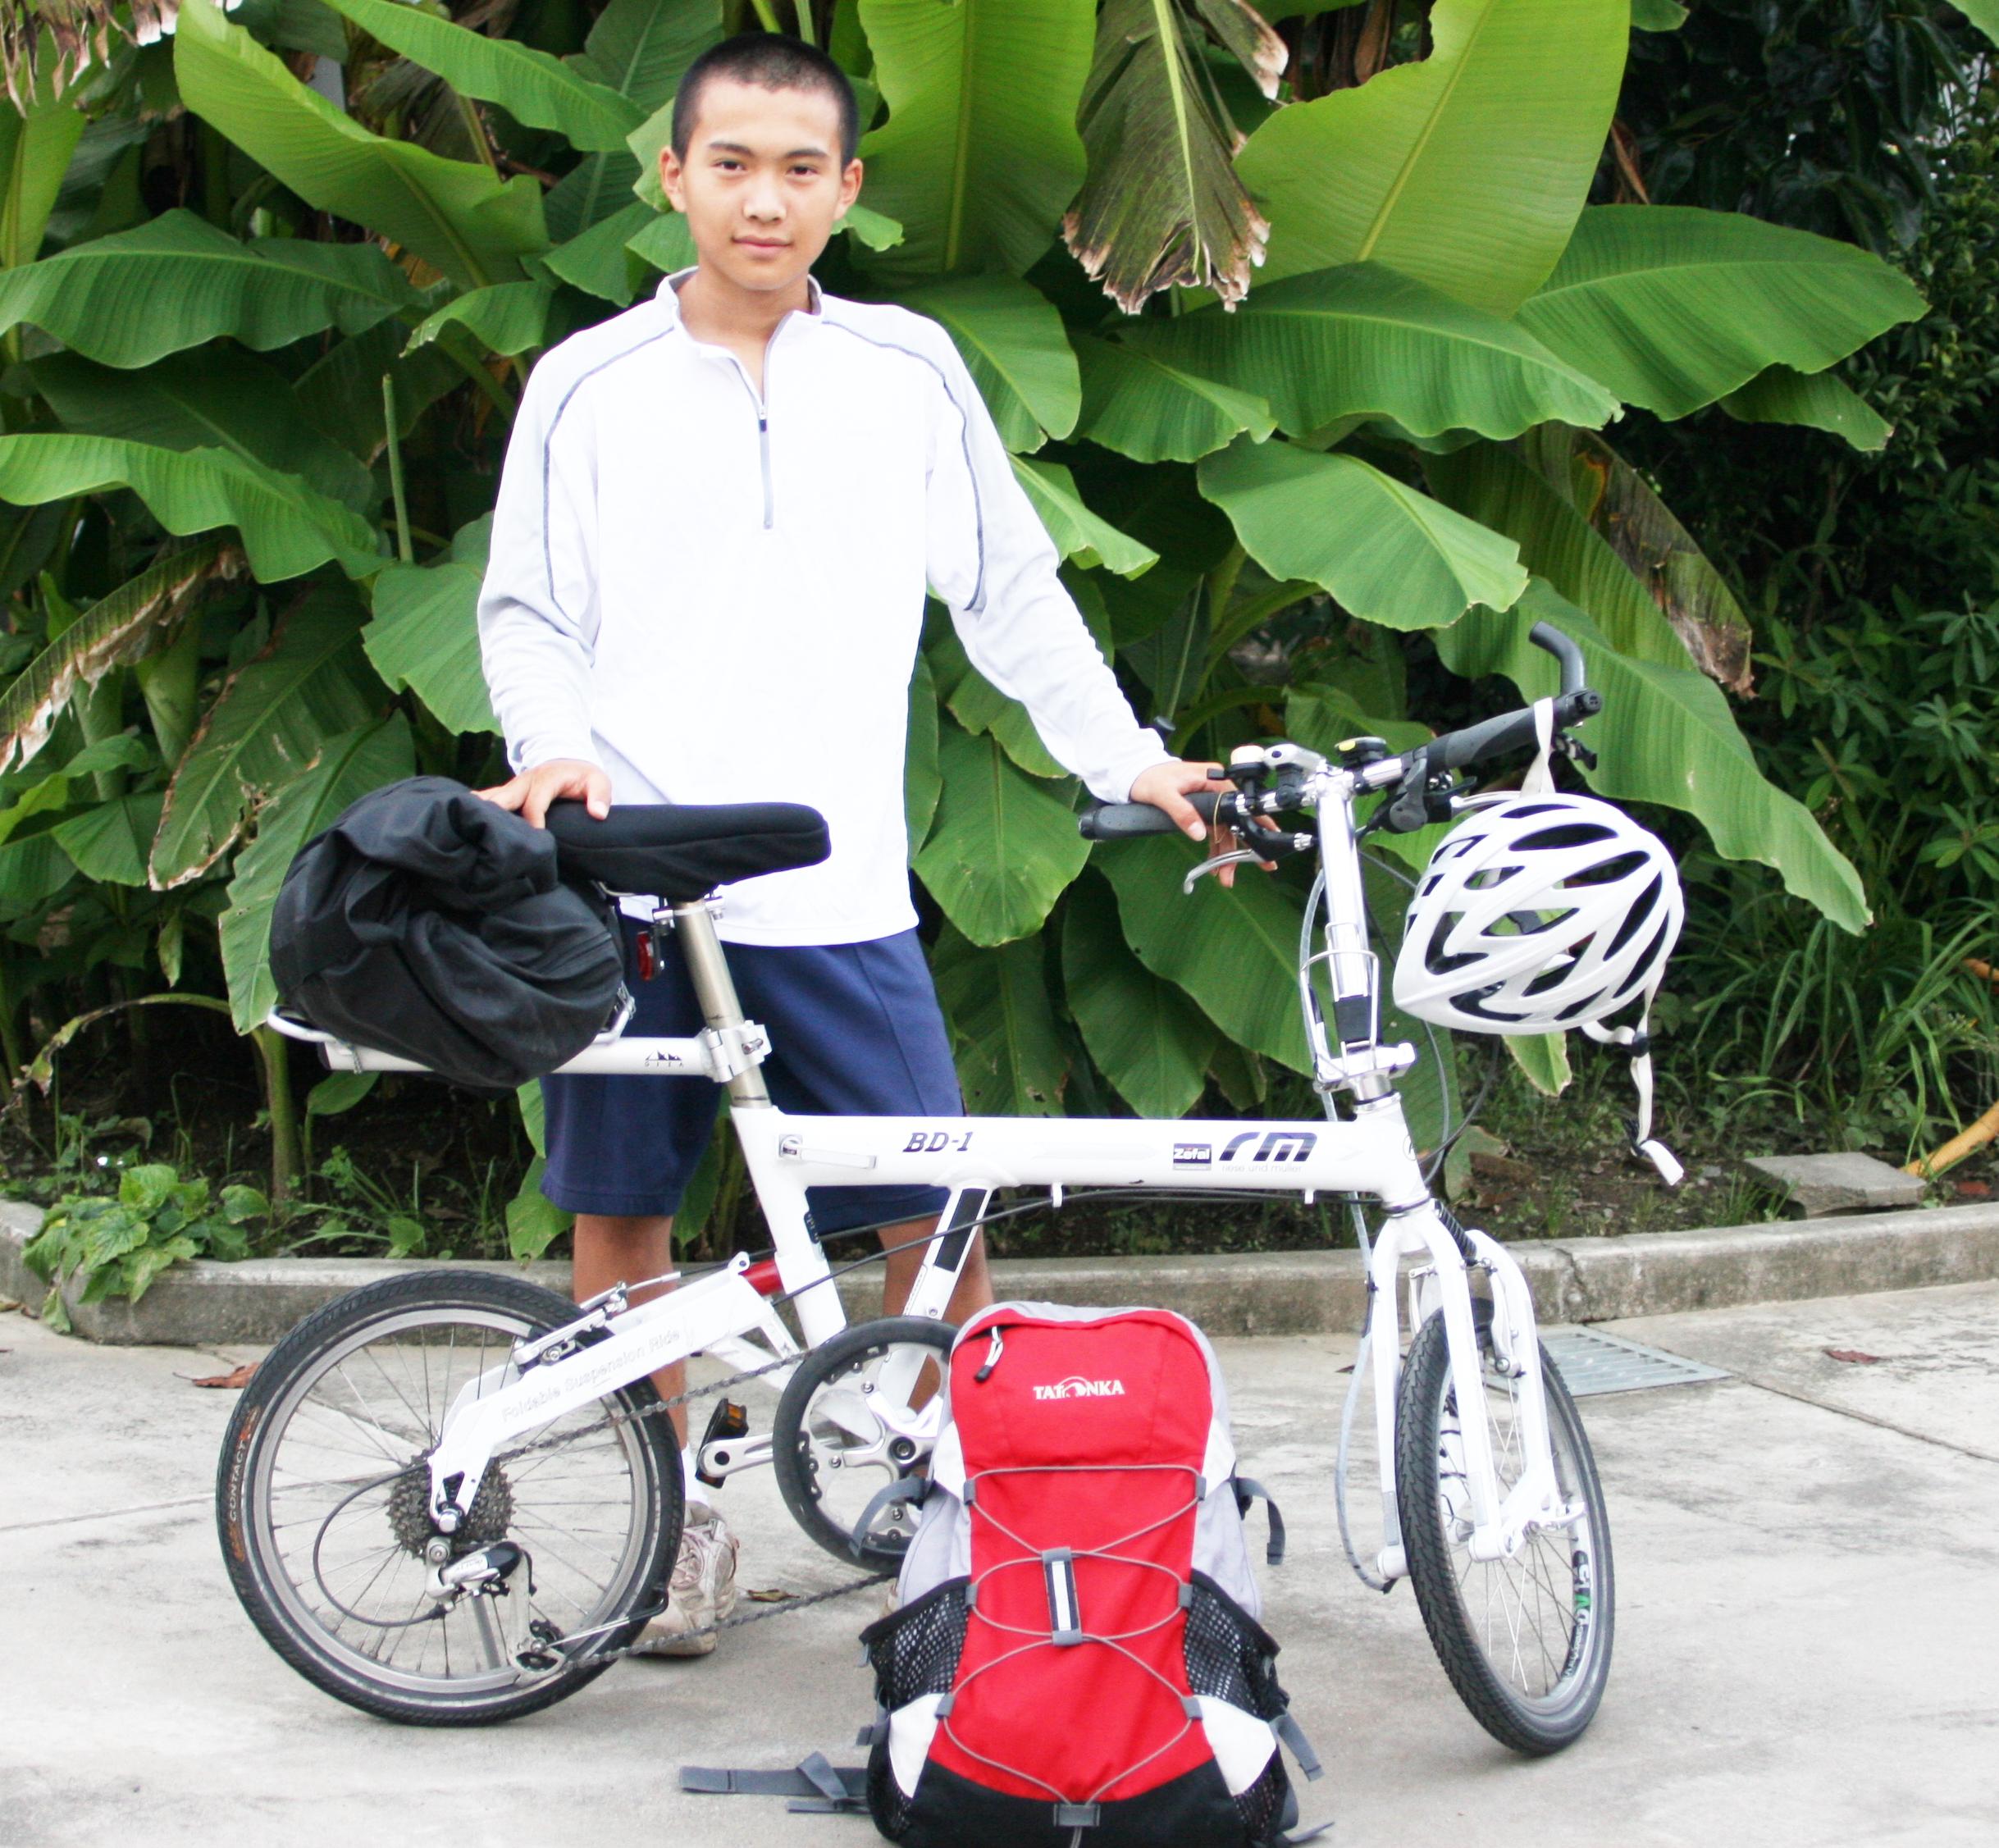 2008自転車の旅報告書用 (1)2